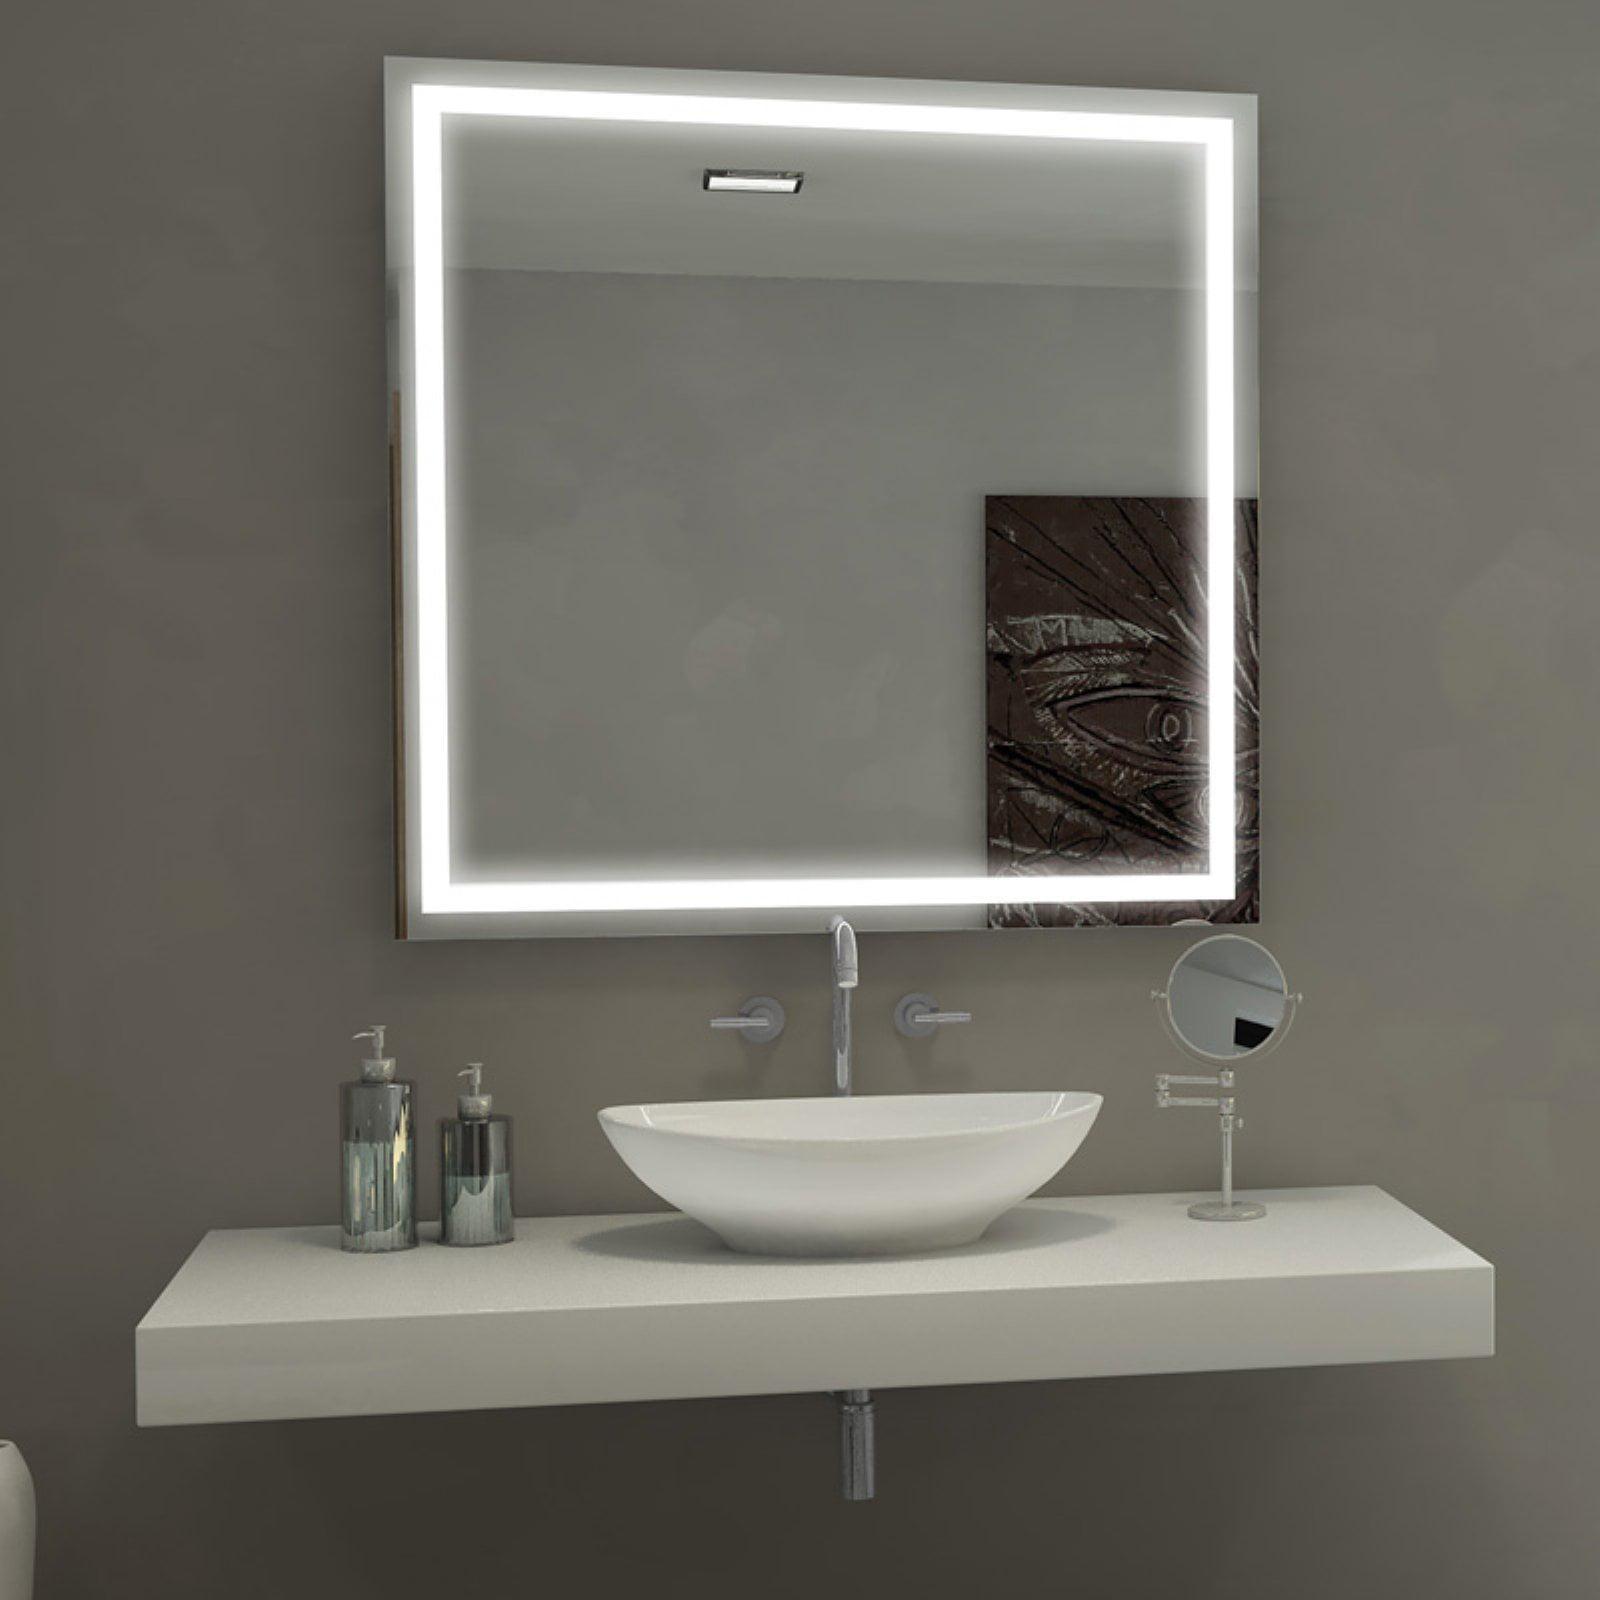 Paris Mirror Harmony Illuminated Bathroom Mirror by Paris Mirror